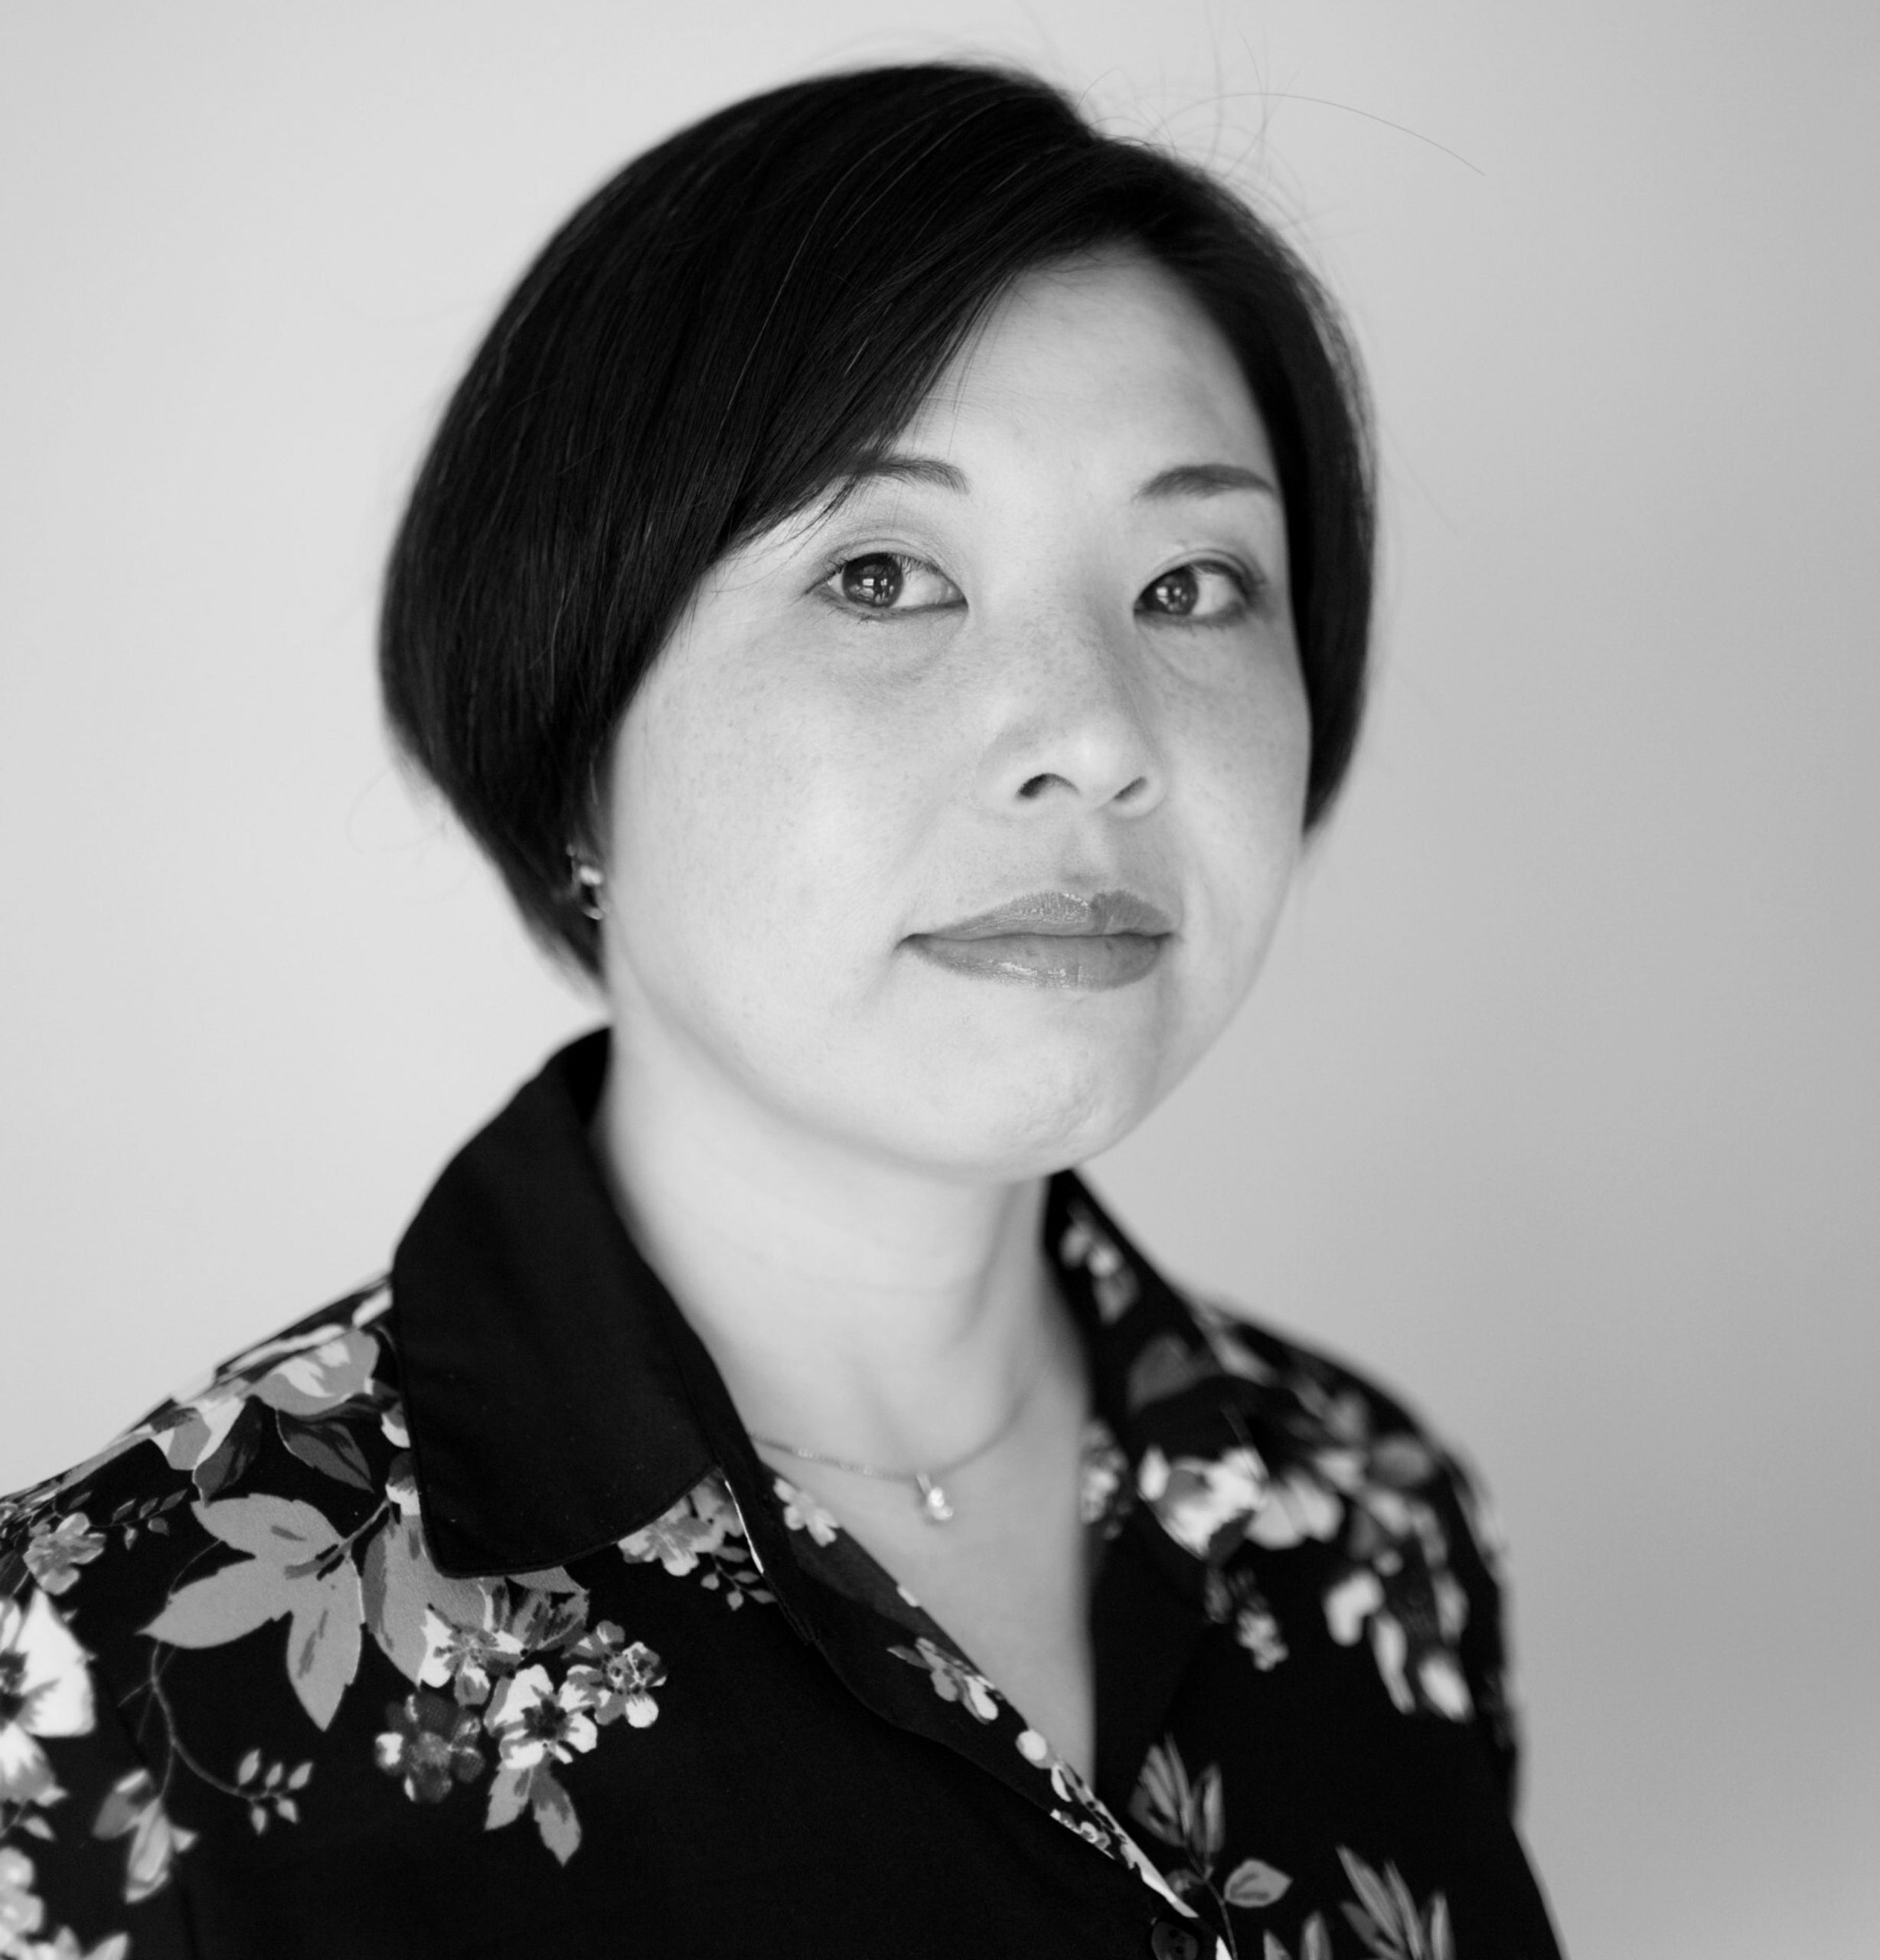 Natsumi Nakayama